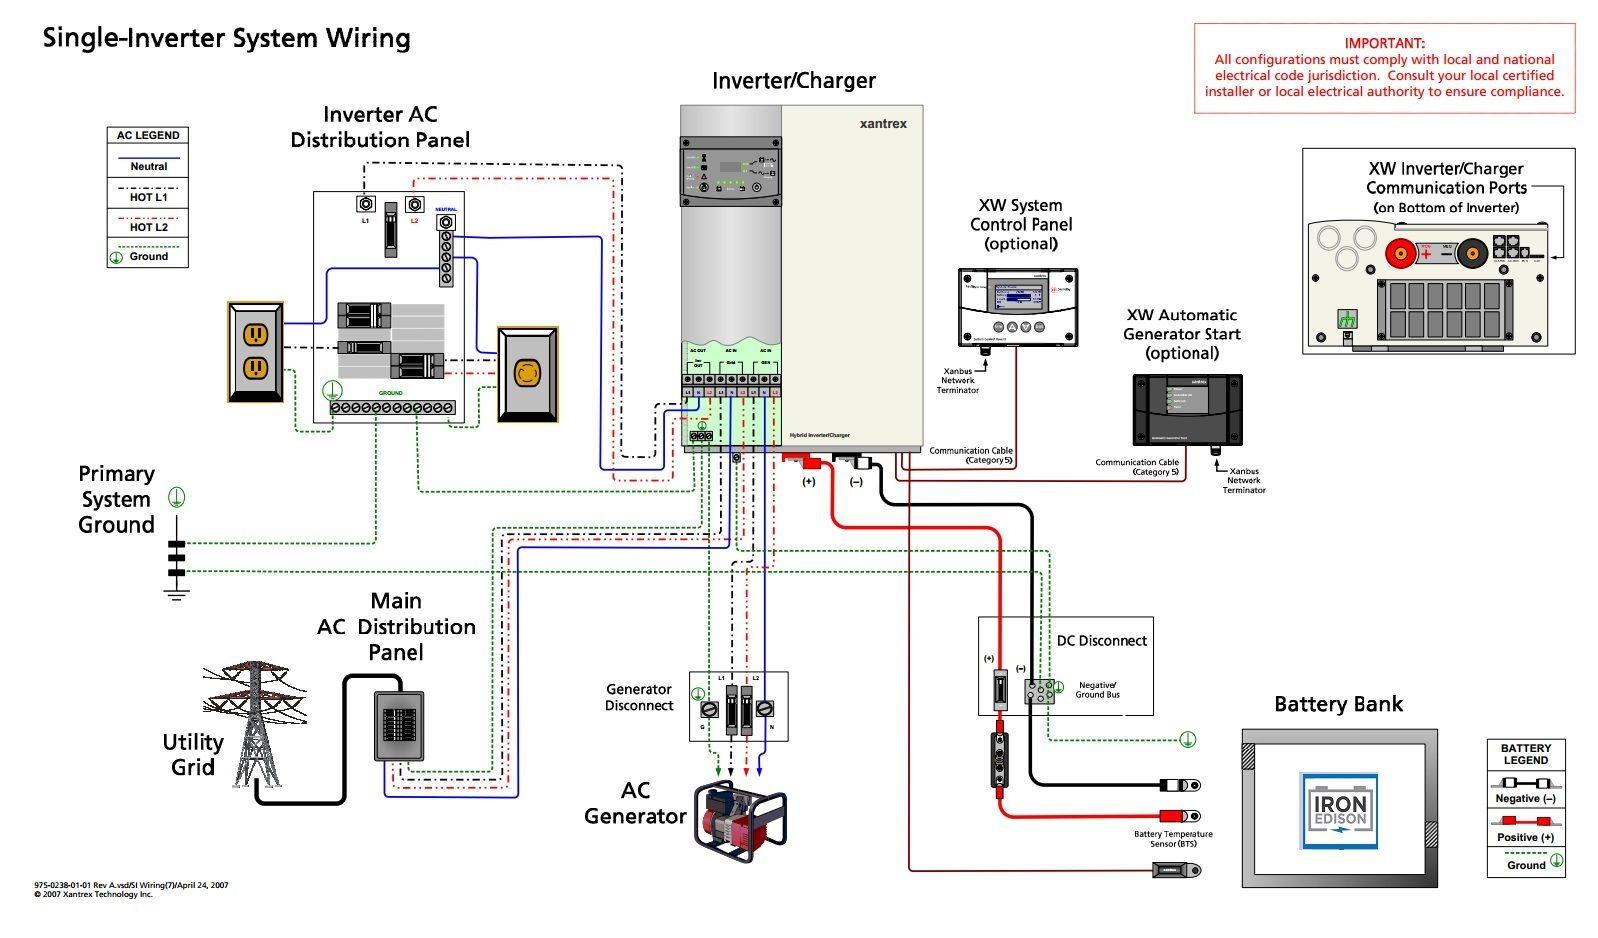 Complete System Wiring Diagram Jpg 1 598 215 938 Pixels